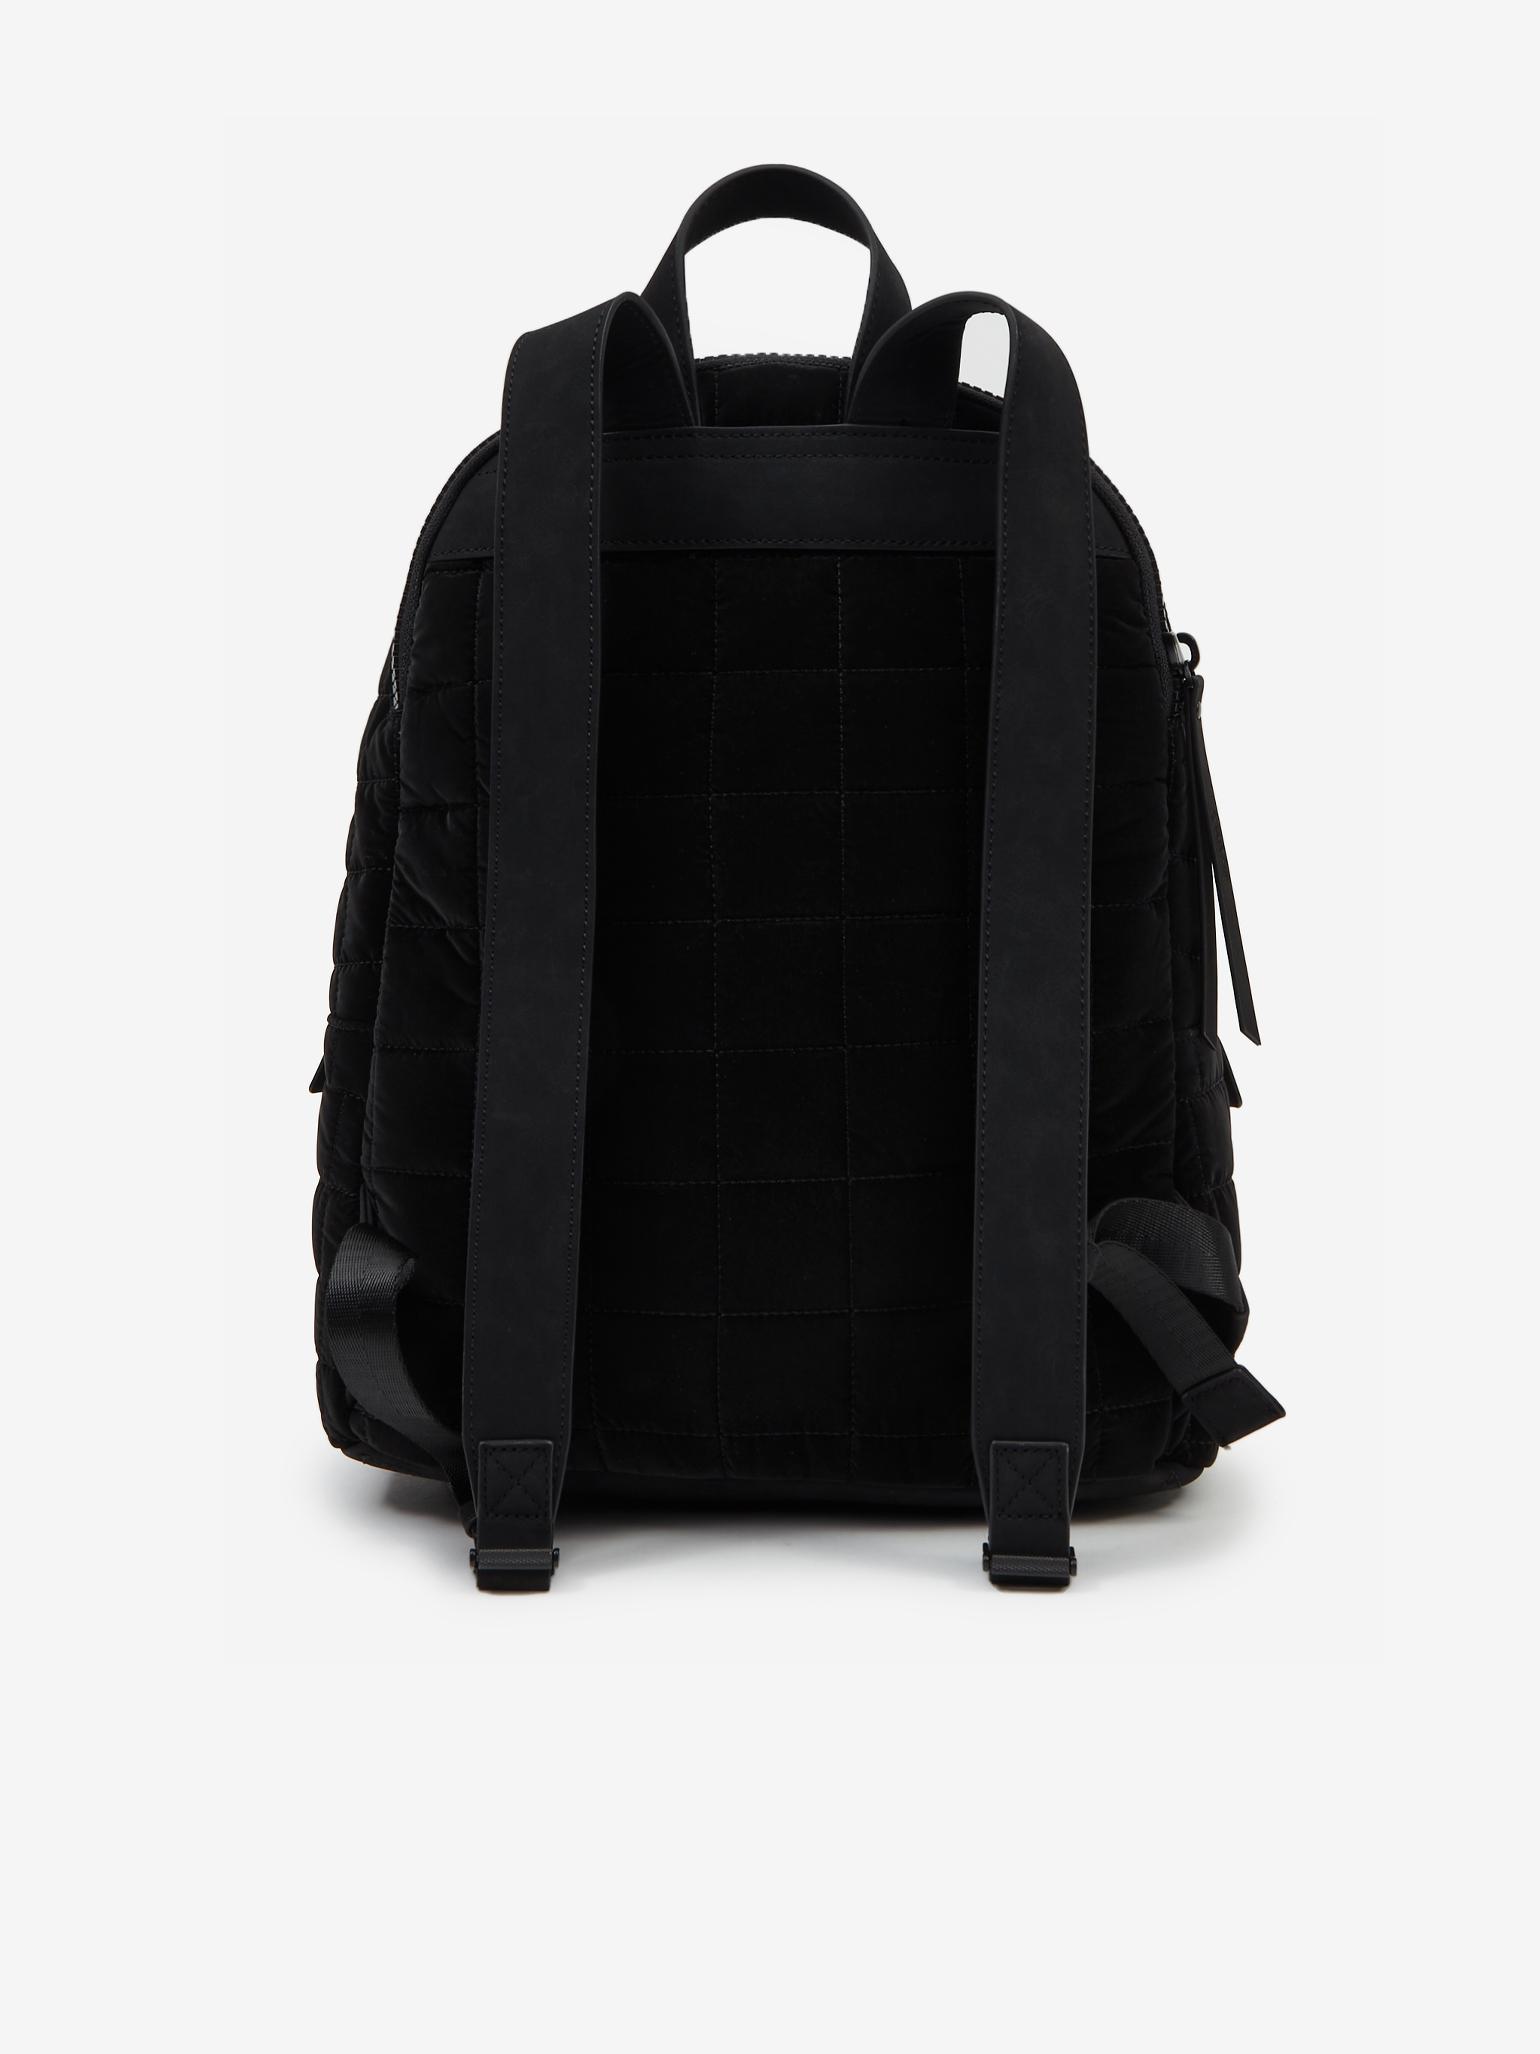 Desigual black backpack Cocoa Mombasa 2zippers